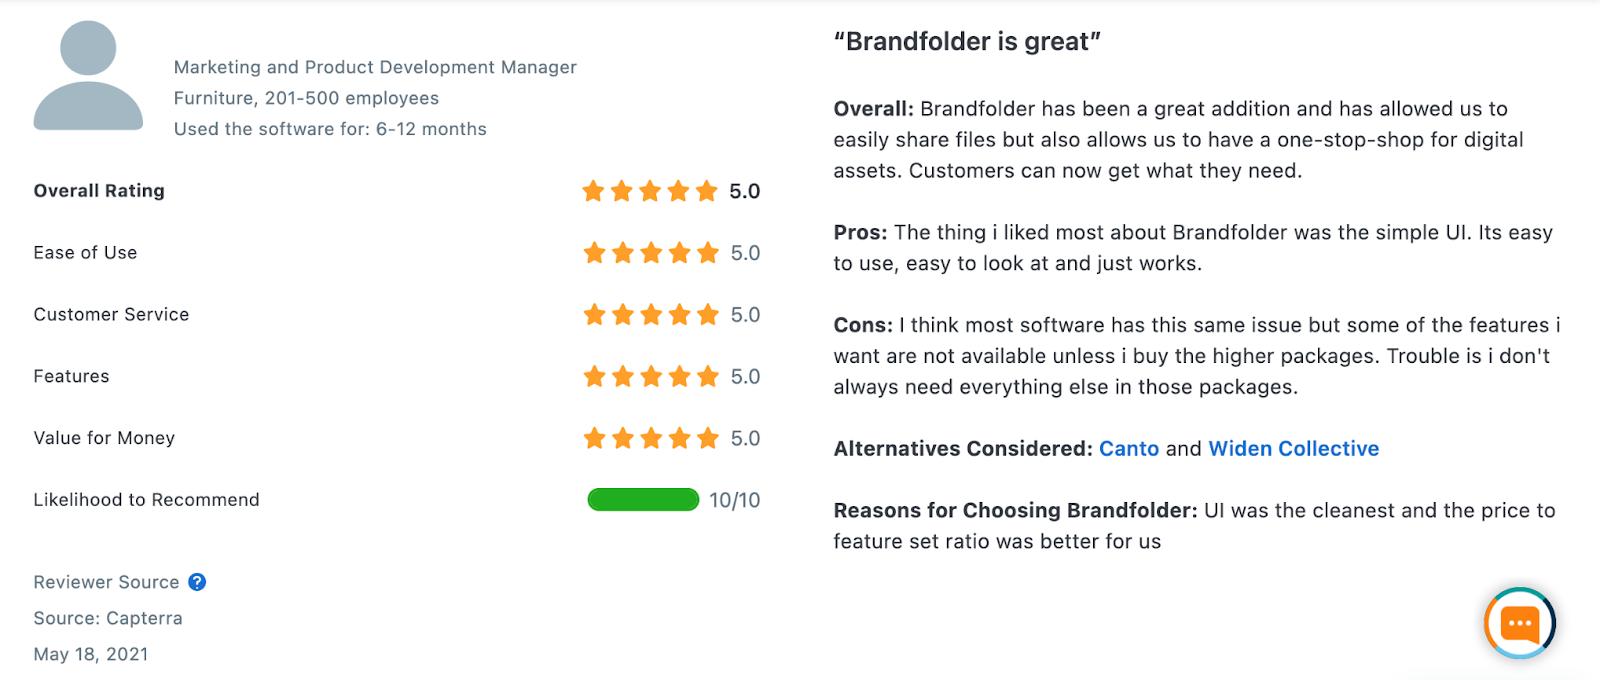 A Brandfolder customer review from Capterra